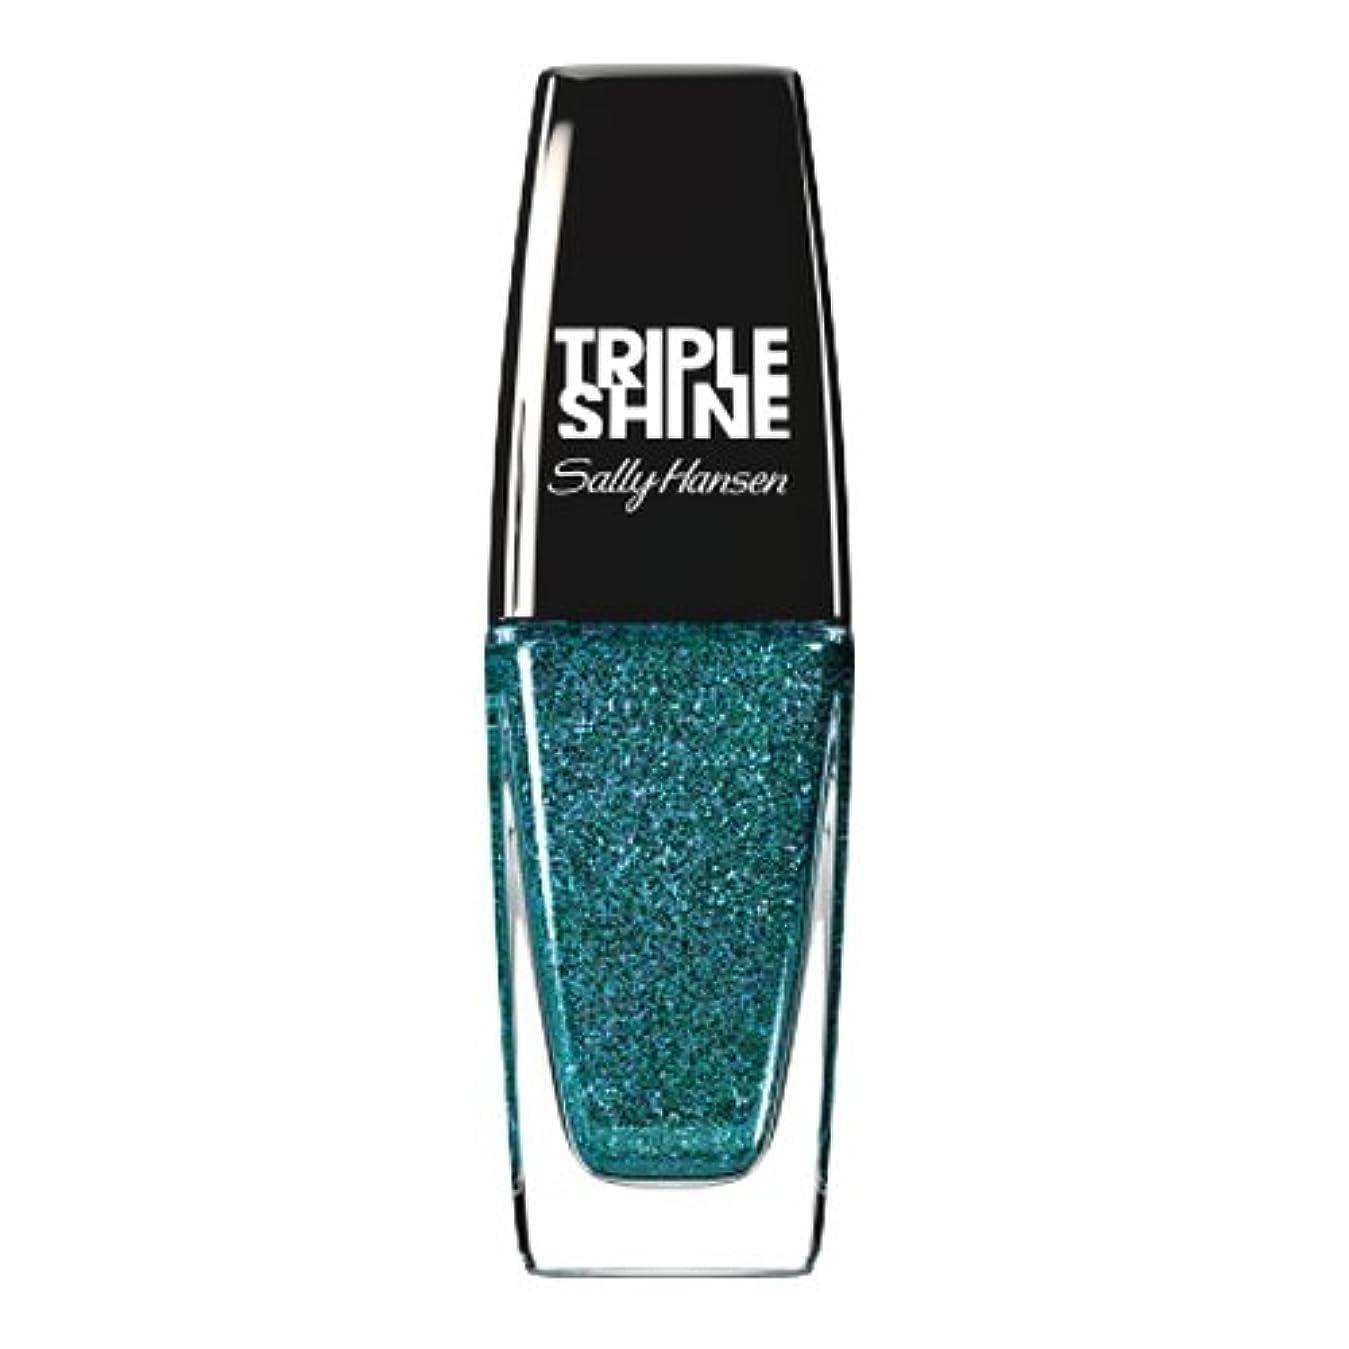 SALLY HANSEN Triple Shine Nail Polish - Sparkling Water (並行輸入品)